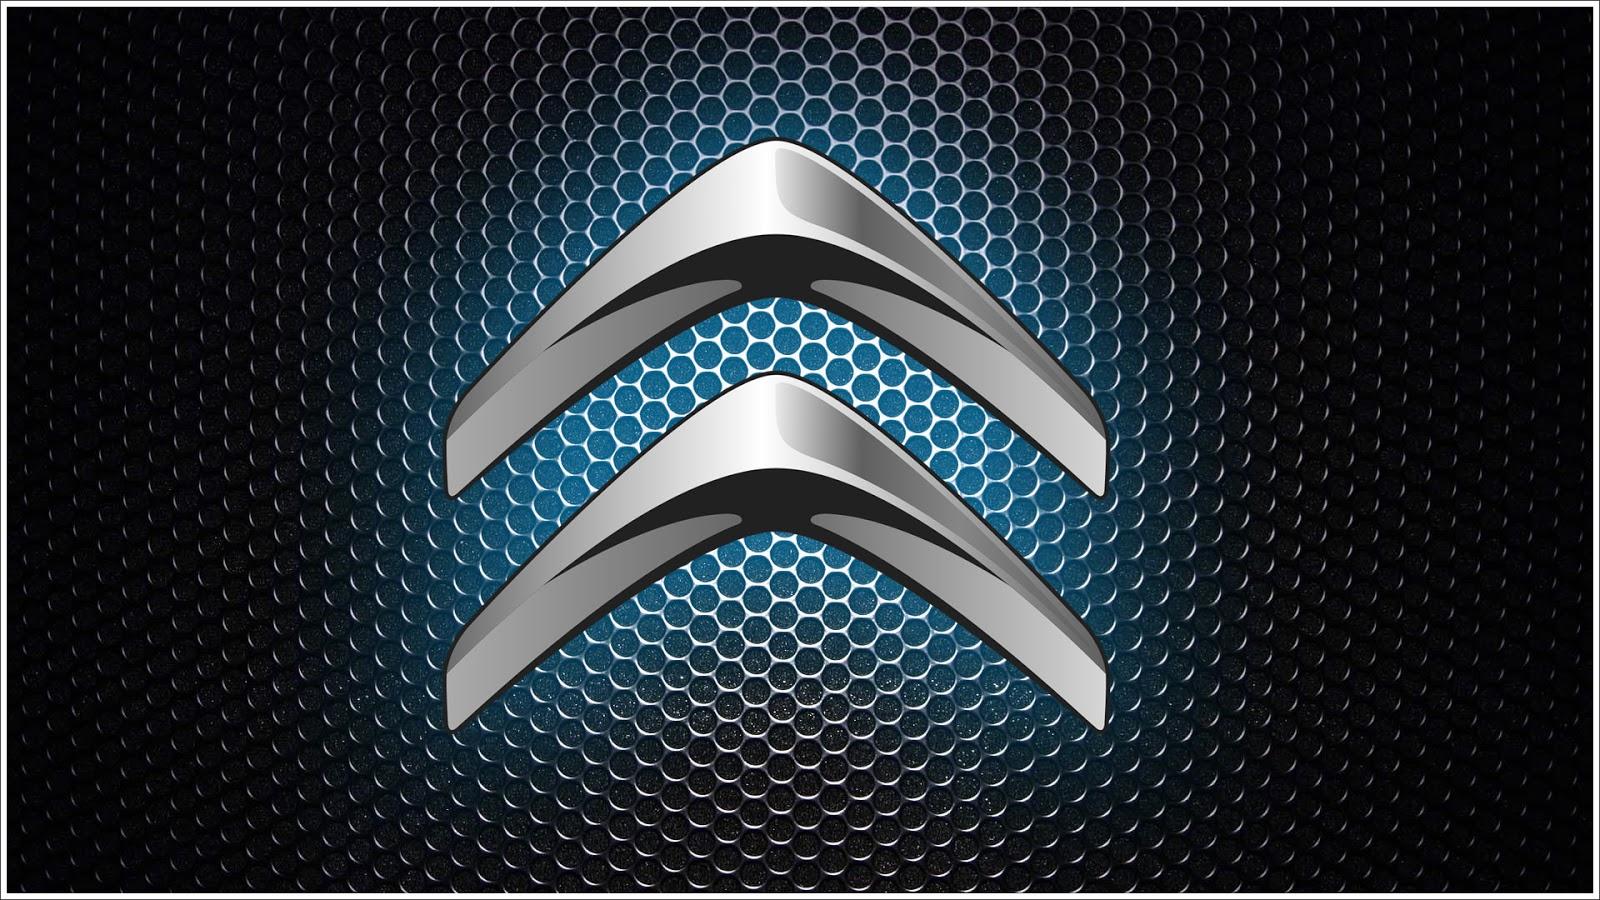 Citroen Logo Wallpaper